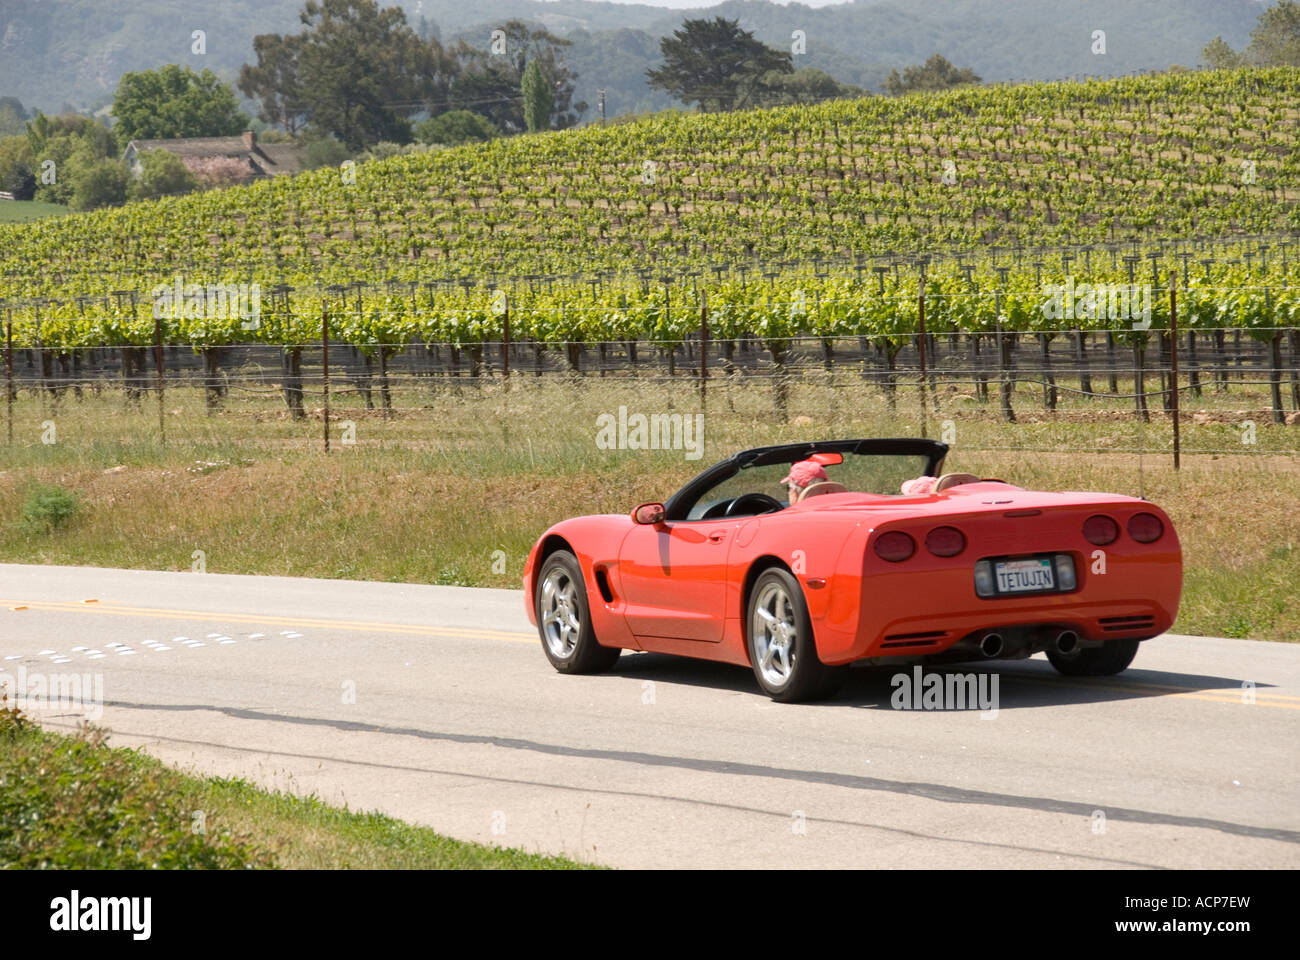 Car touring in Edna Valley wine country near San Luis Obispo, California - Stock Image